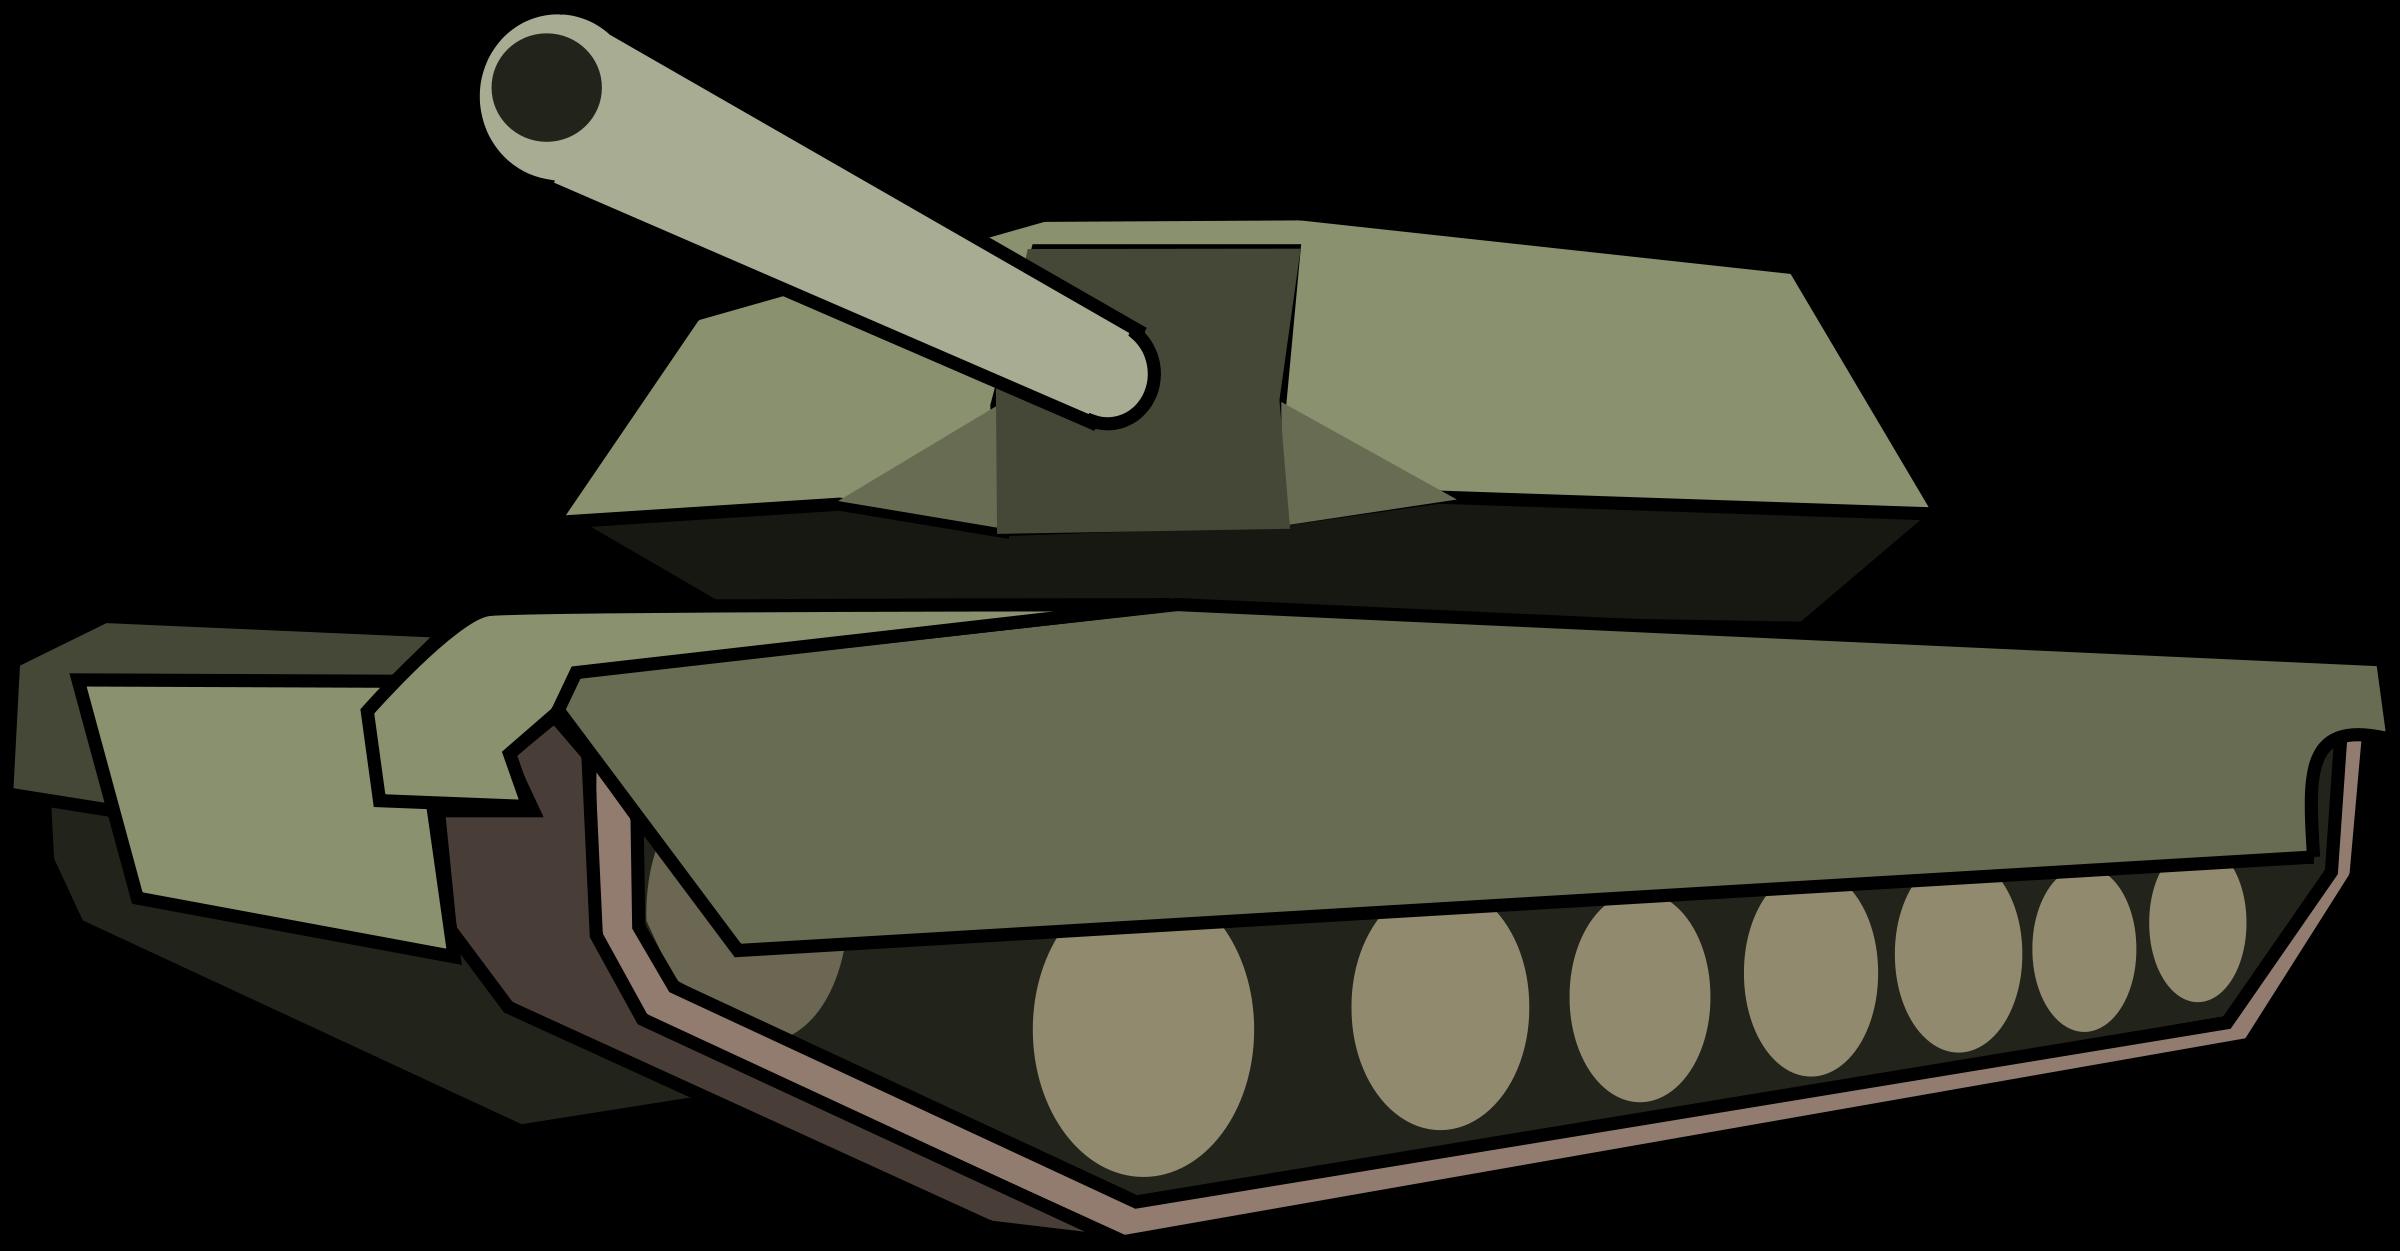 Tank clipart Clip Clipart tank%20clipart Clipart Images